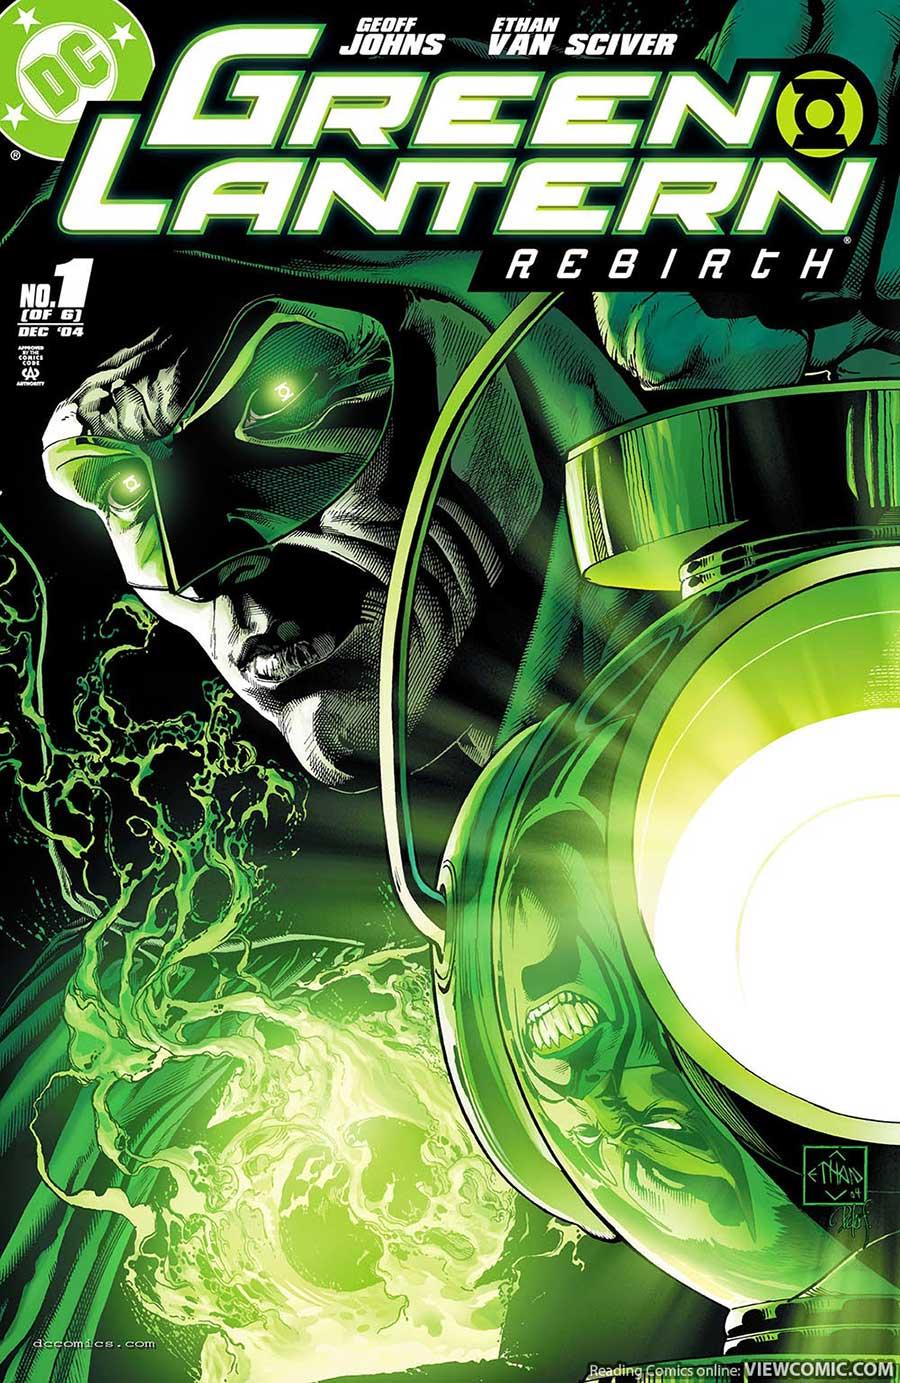 Green Lantern (Geoff Johns)